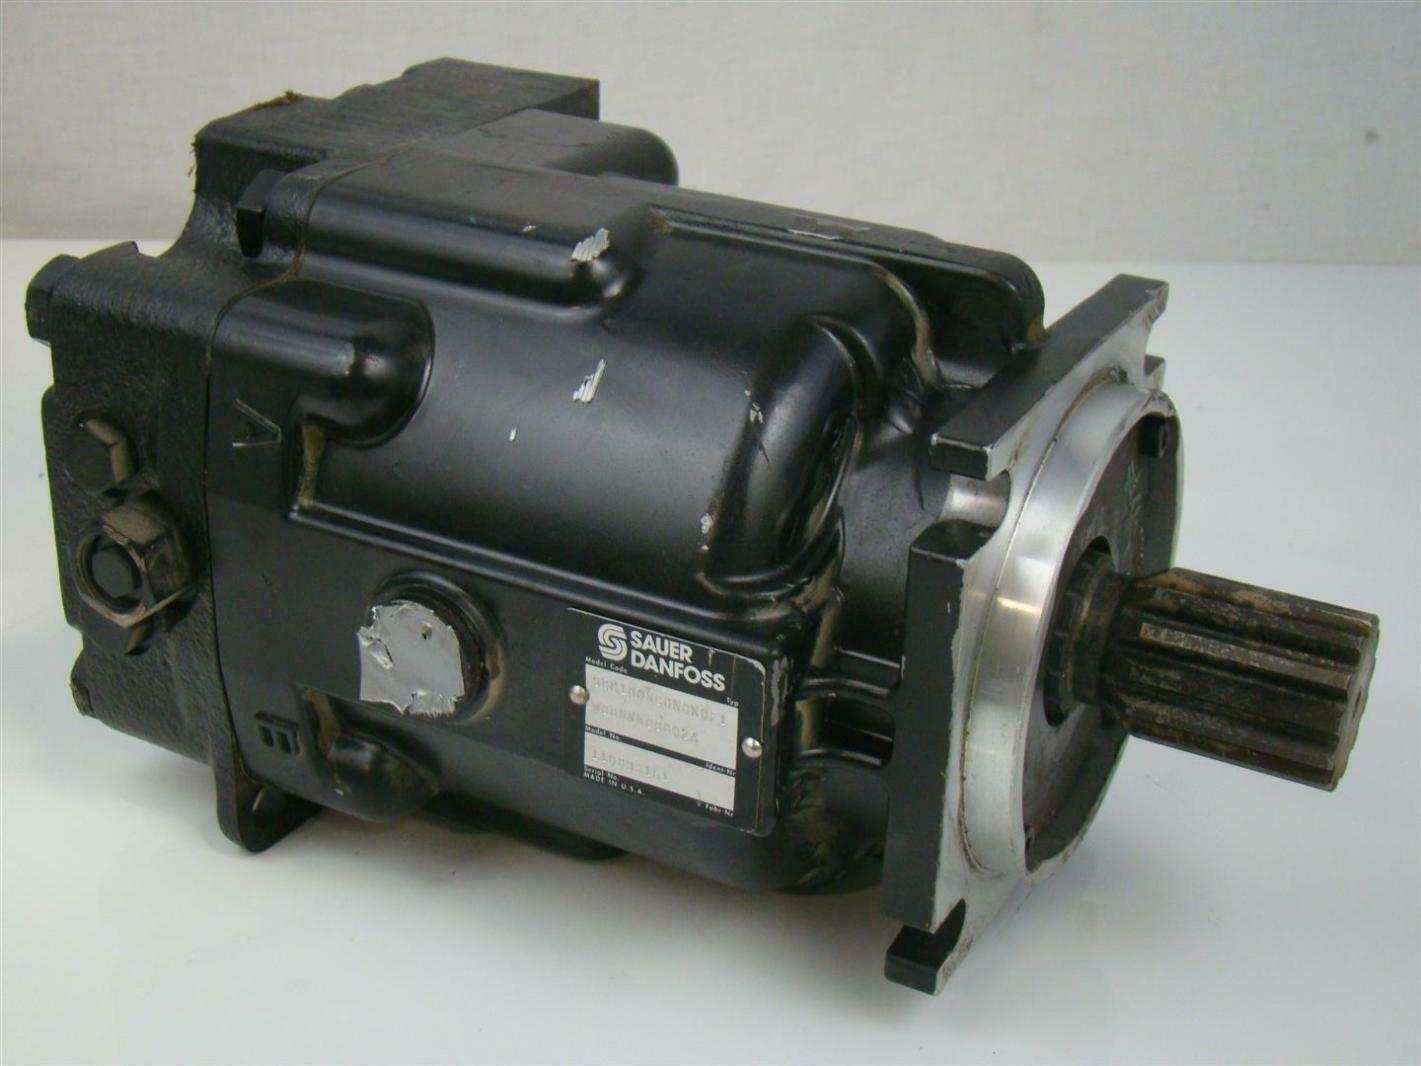 Sauer danfoss axial piston hydraulic motor shaft for Hydraulic pump with motor